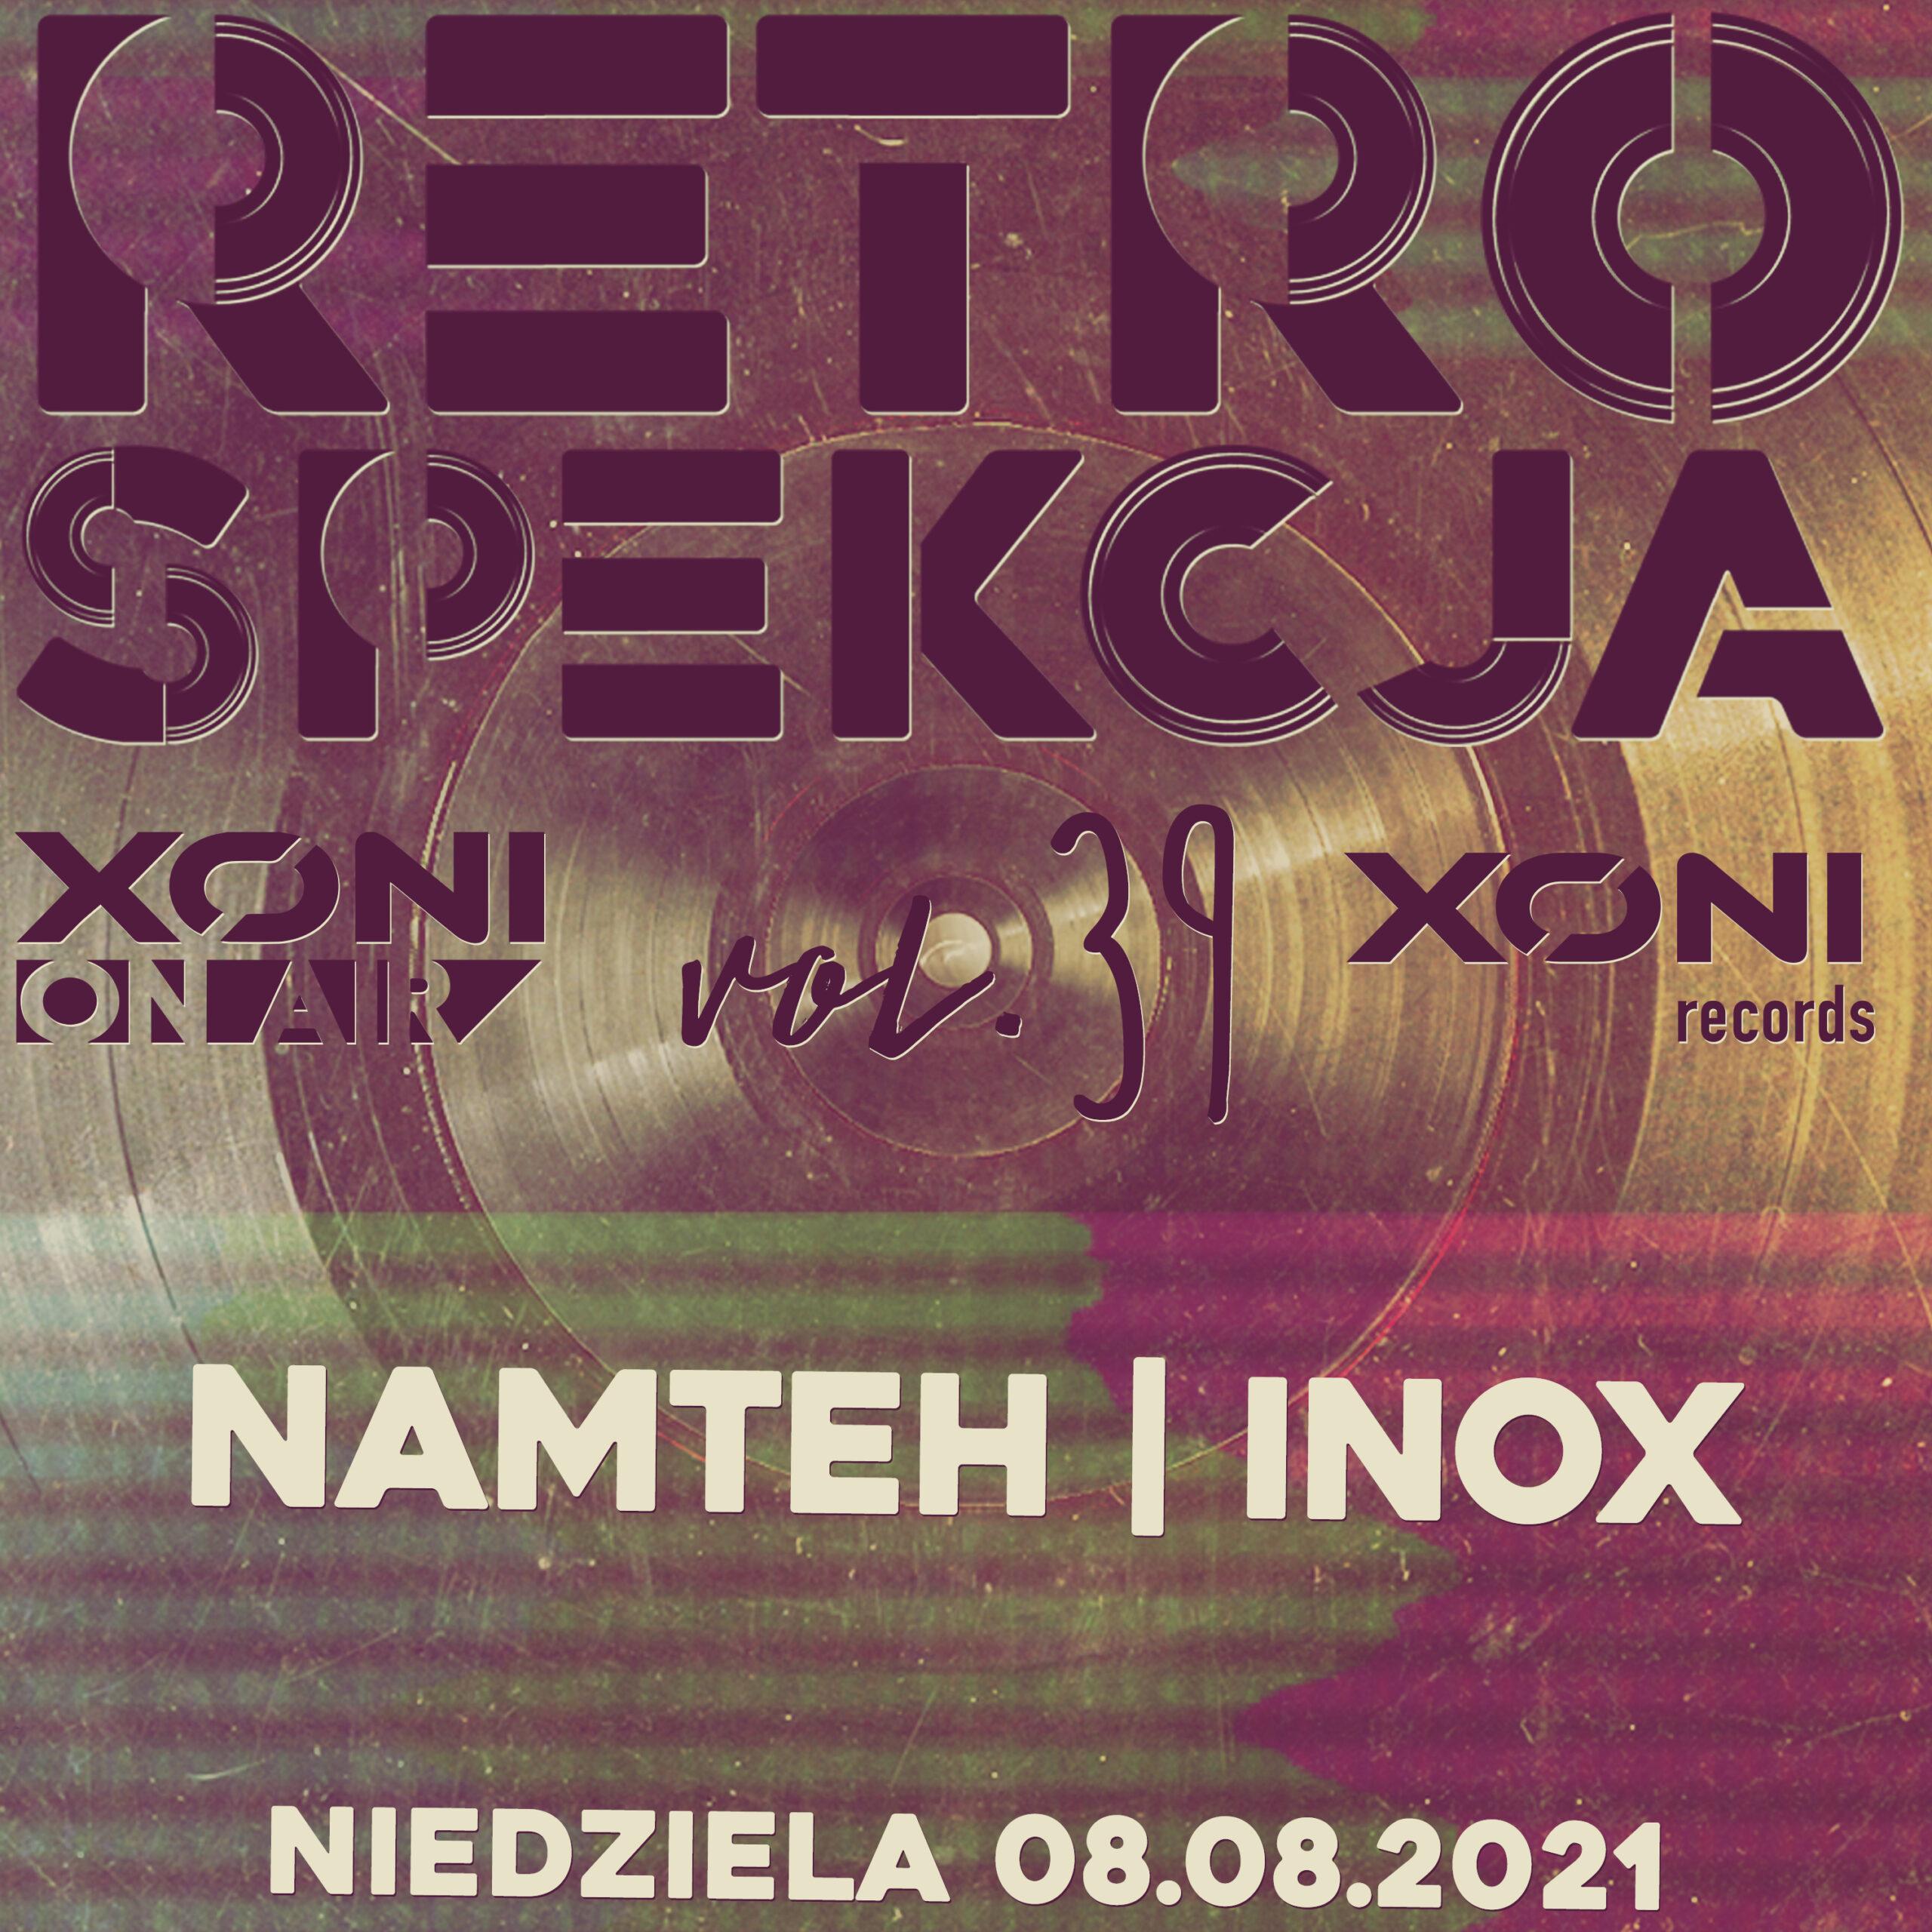 Retrospekcja Vol.39 Namteh/Inox